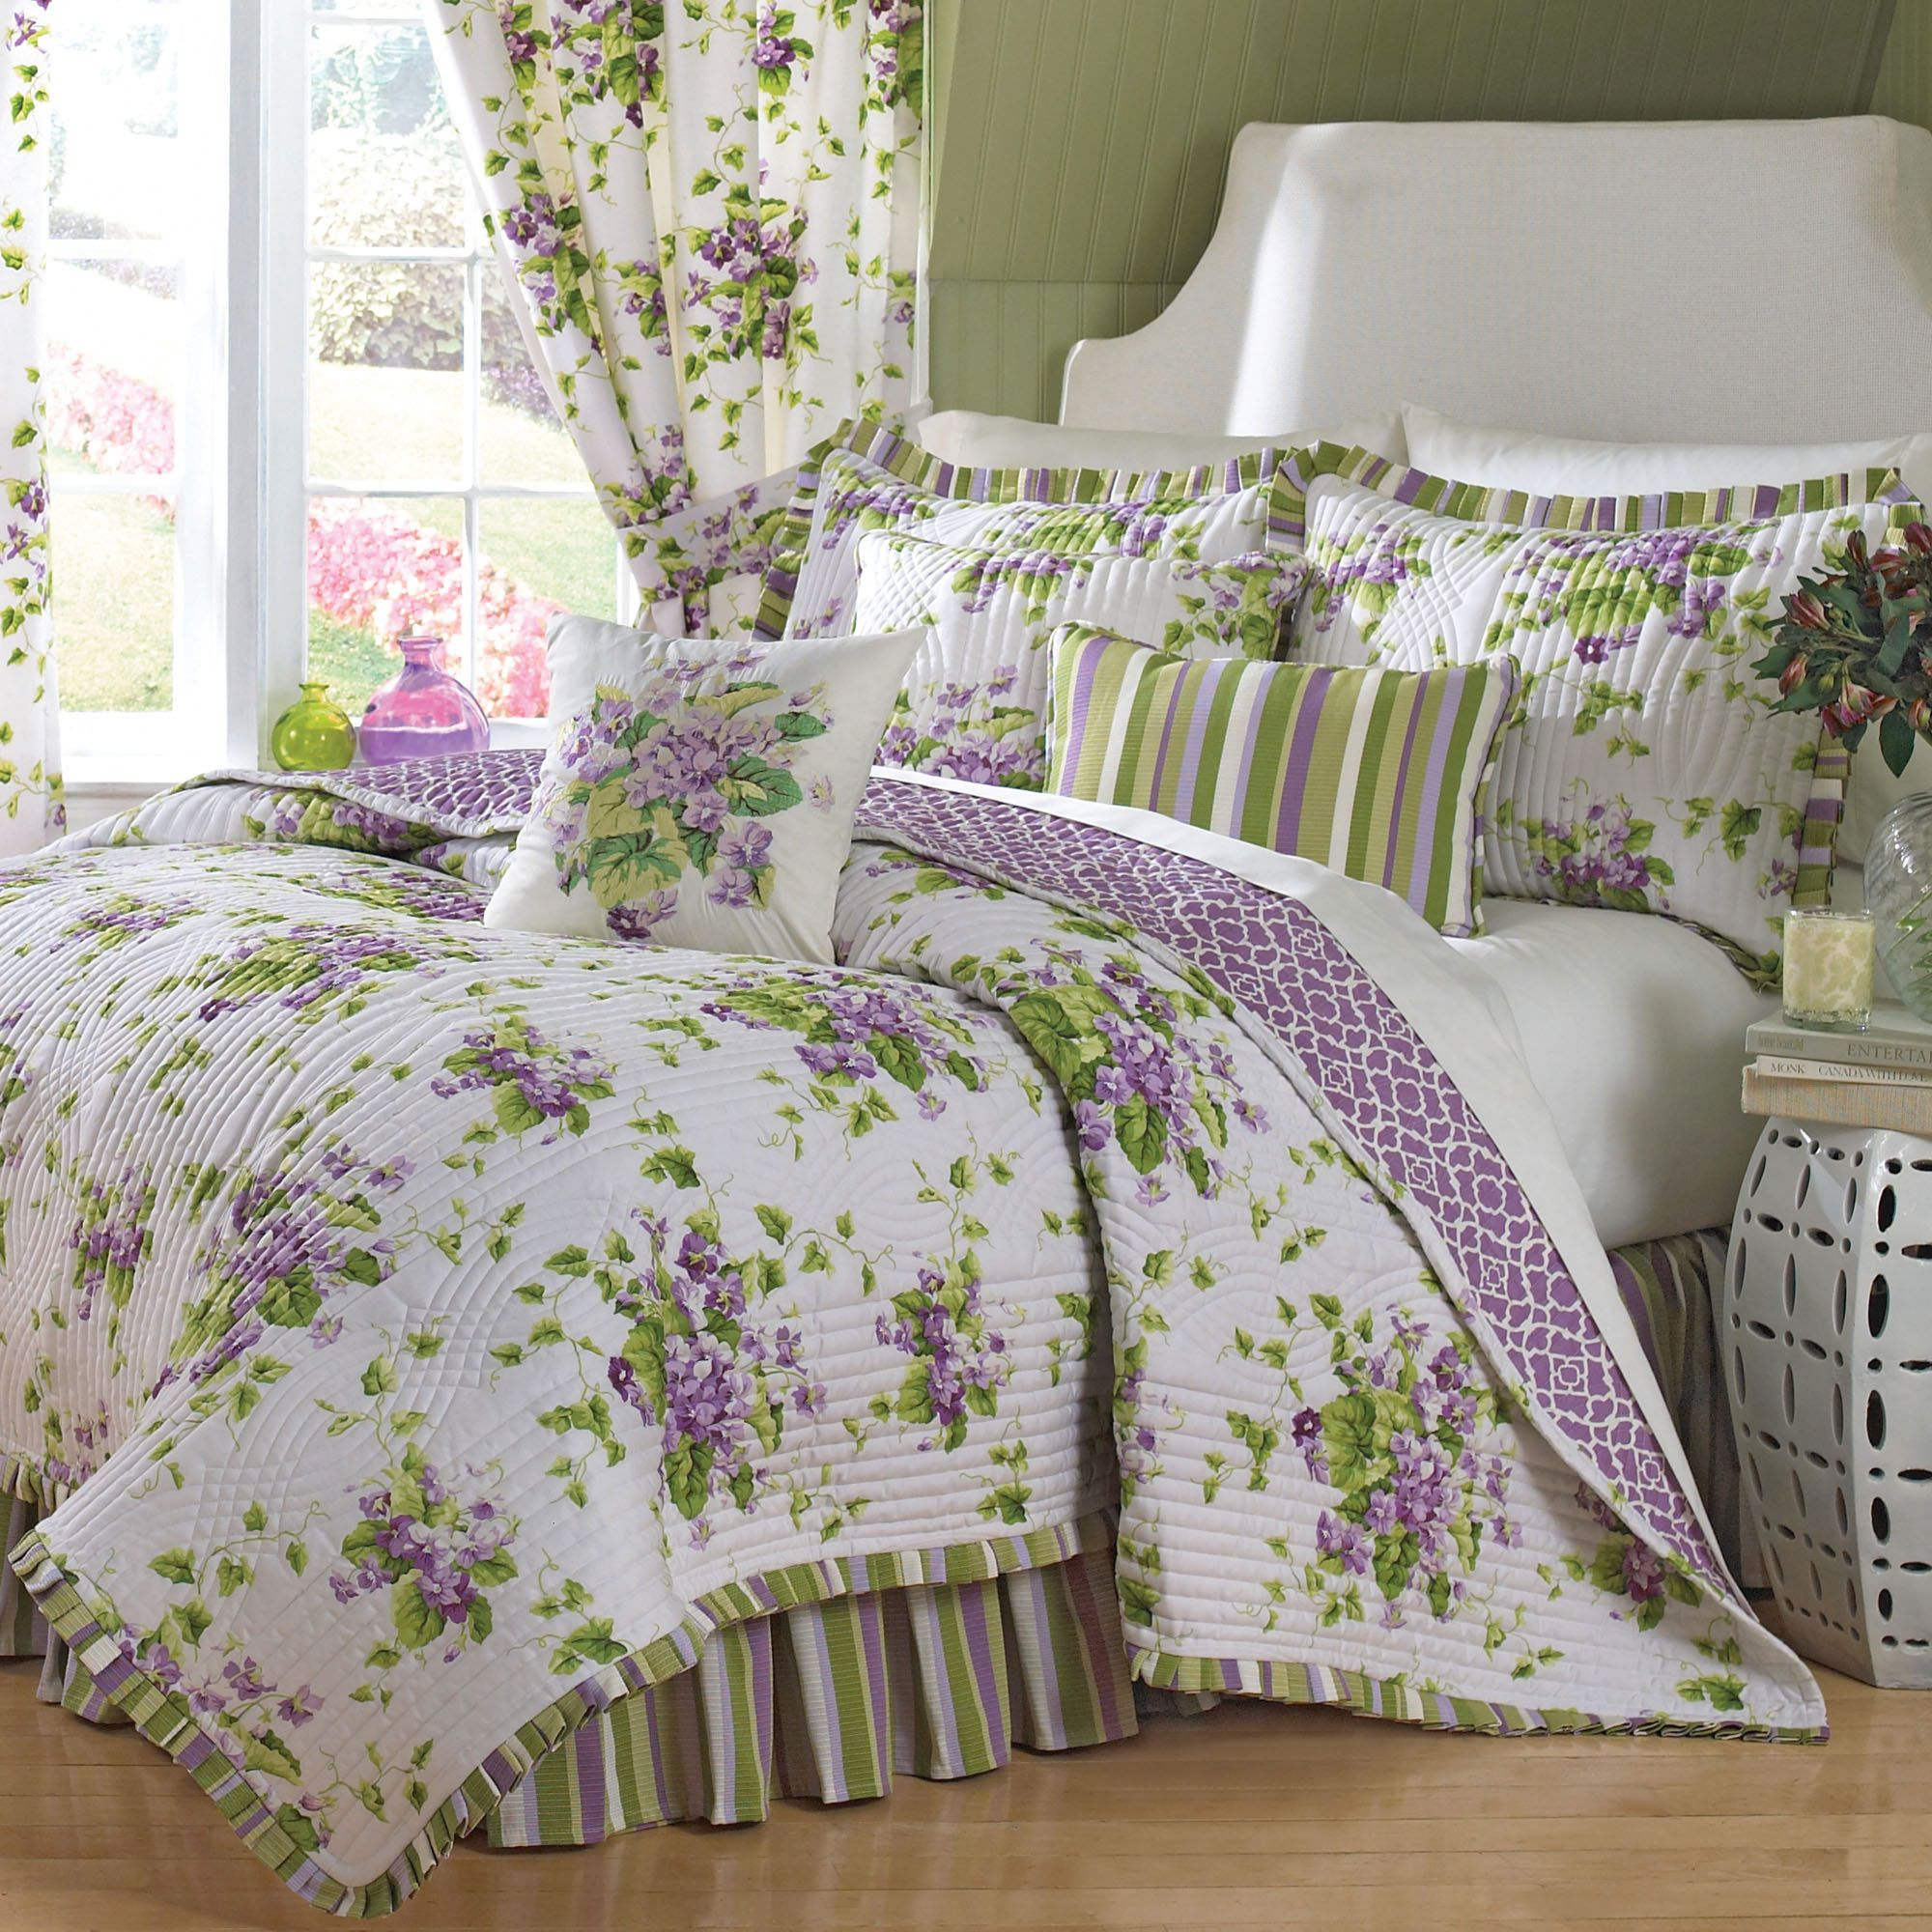 Sweet Violets Floral Quilt Set Bedding By Waverly Quilt